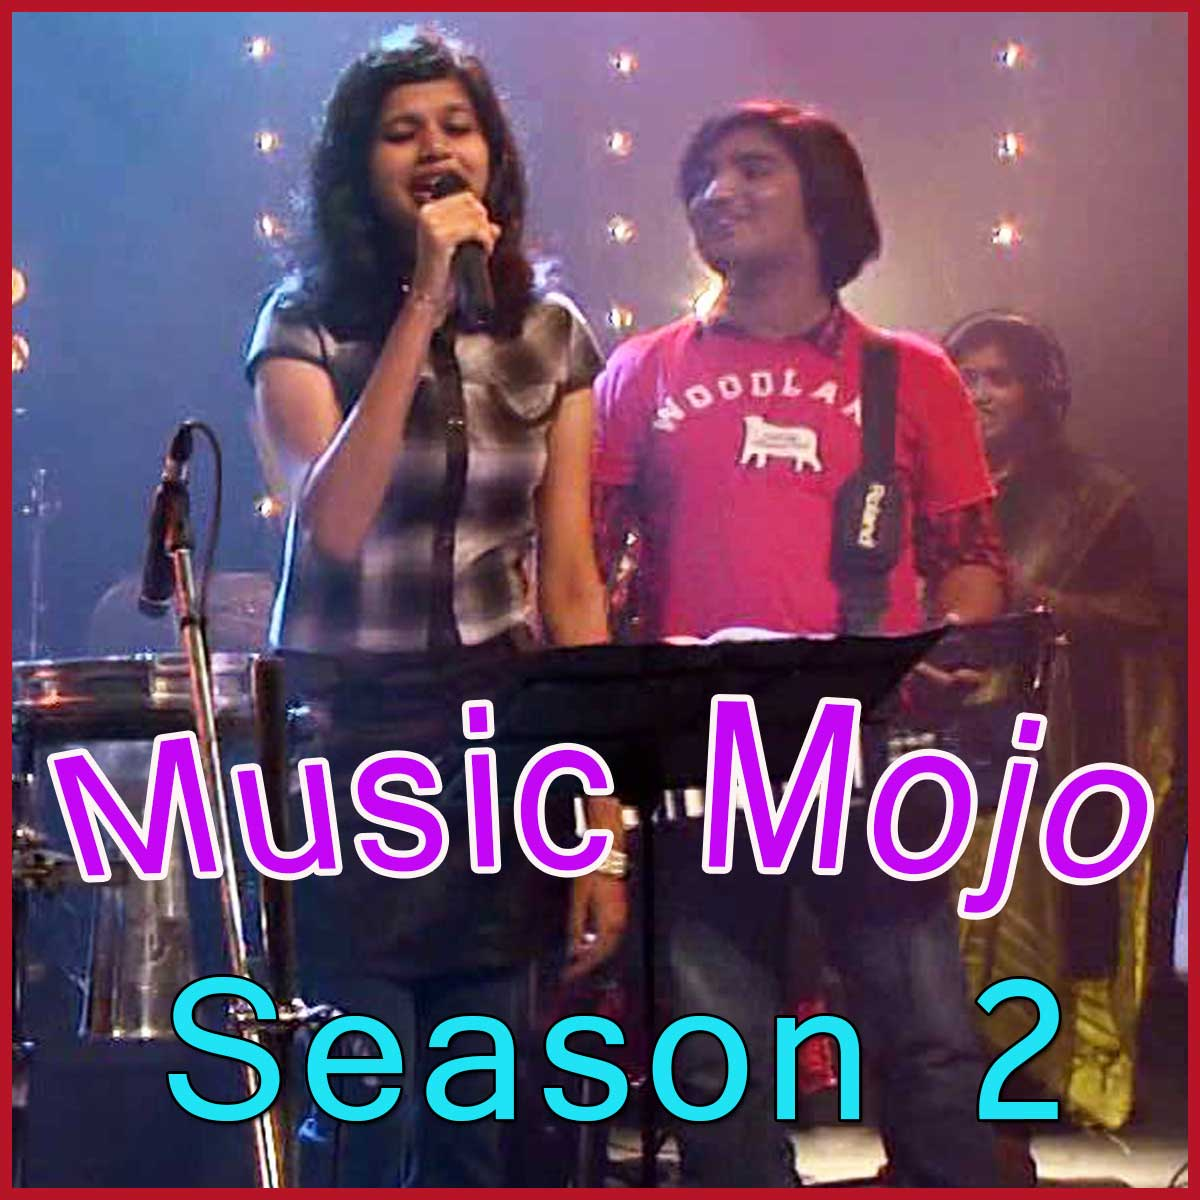 Music-Mojo-Season-2-Anjali-Anjali-The-Southend